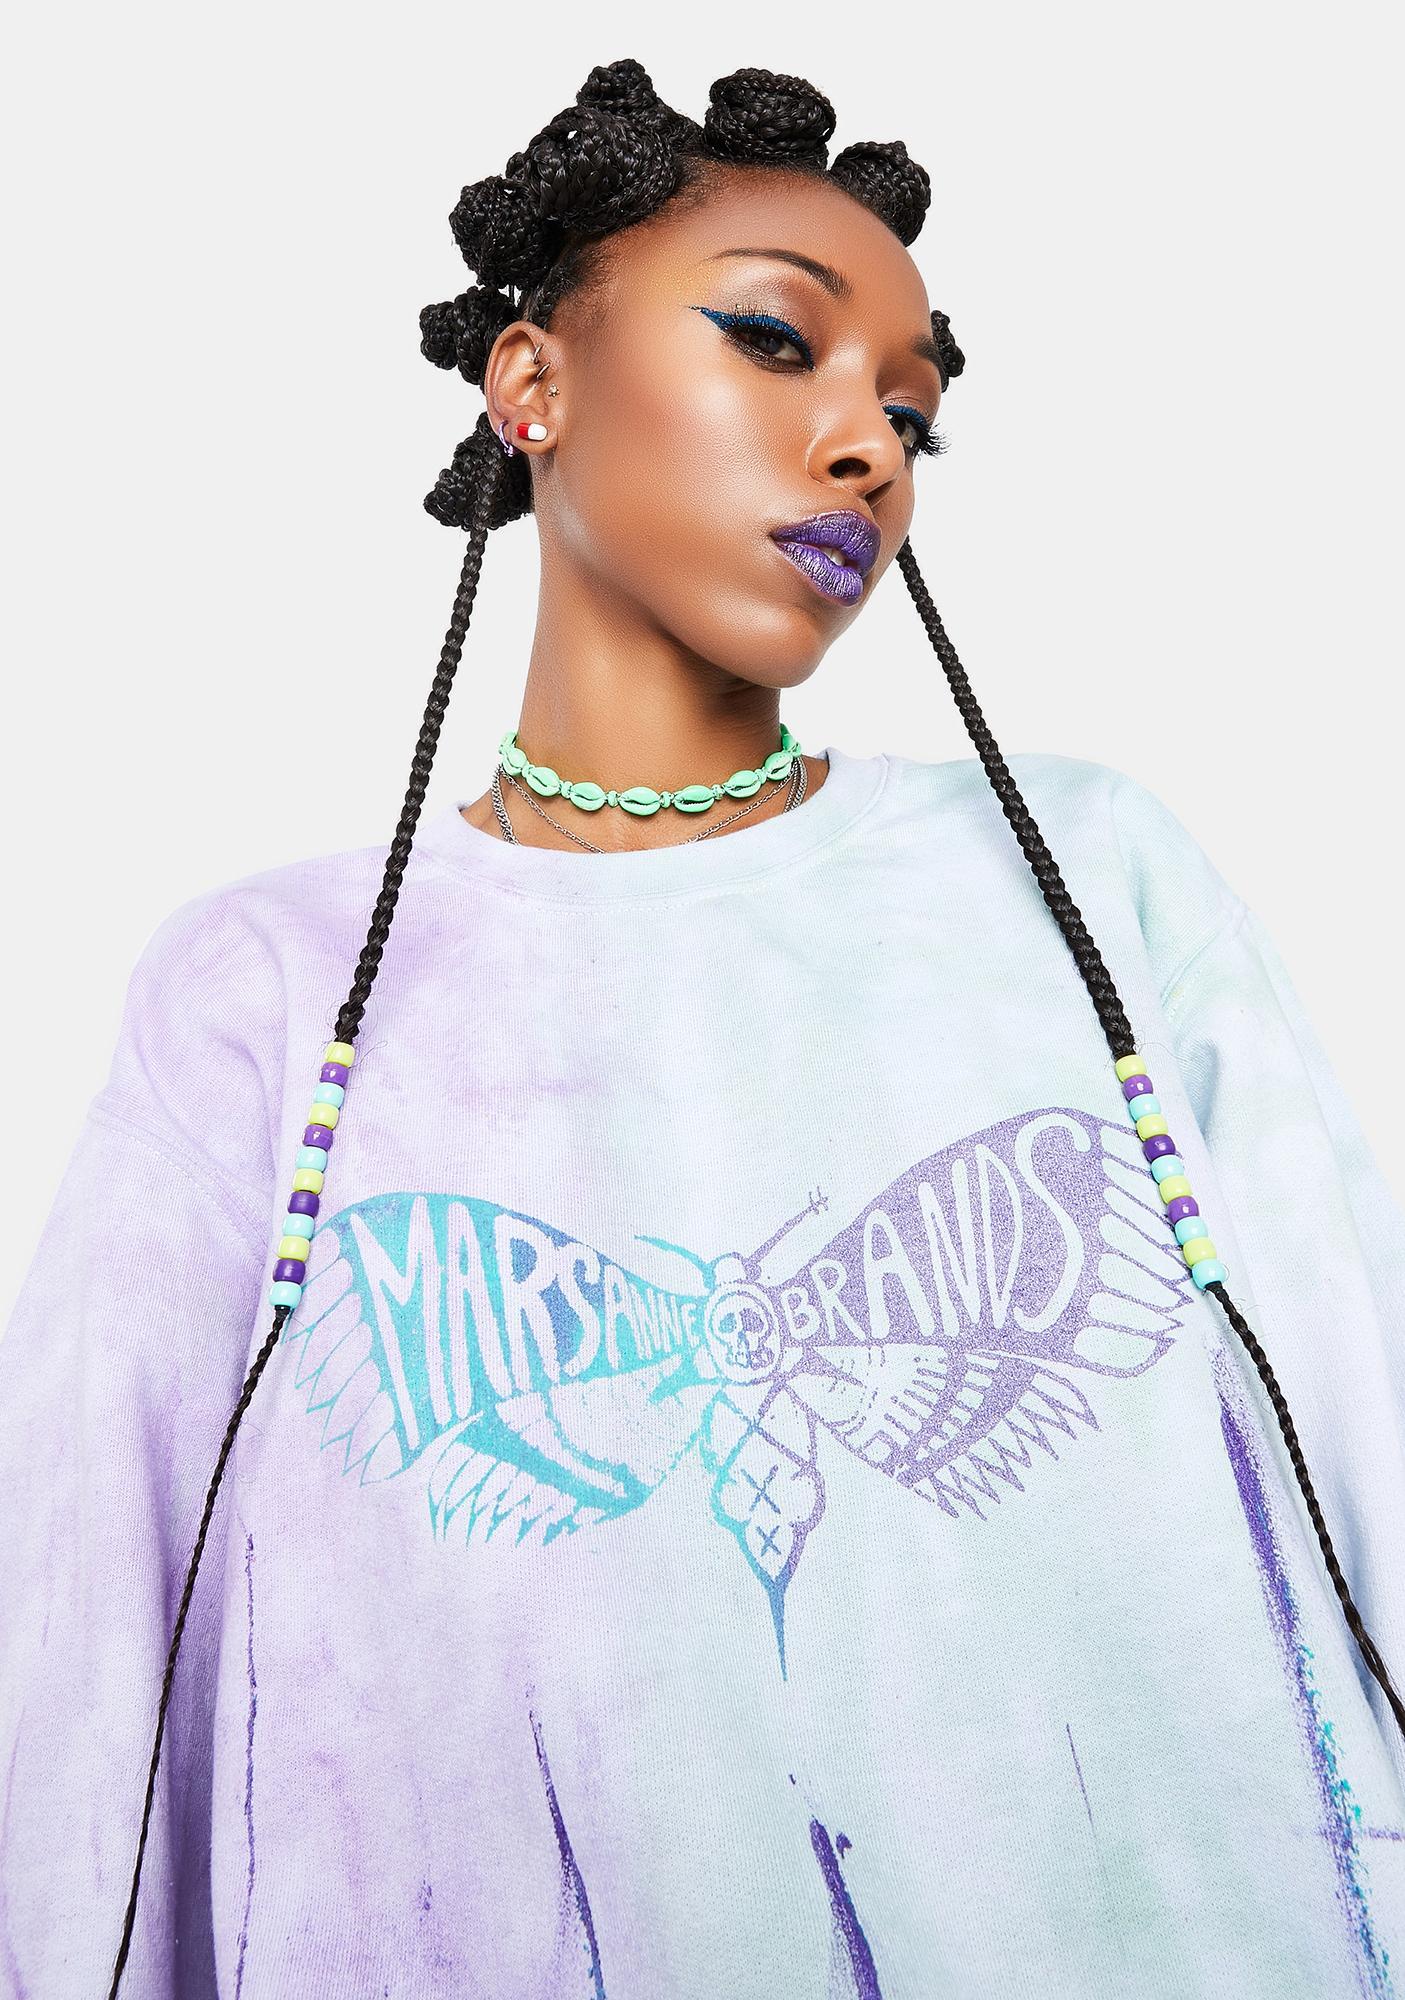 Marsanne Brands Skoth Crew Sweatshirt